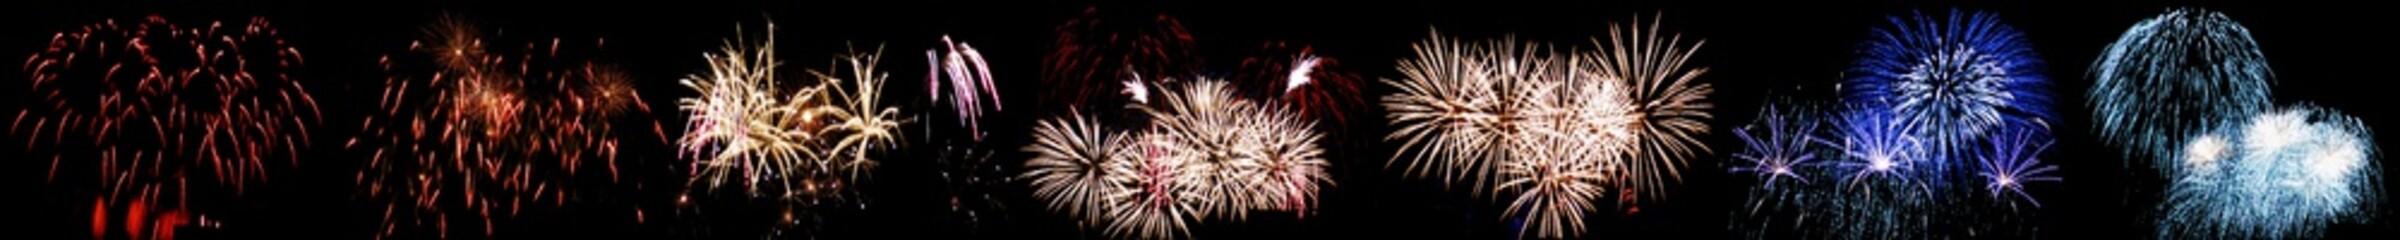 Berlin panoramic fireworks, Germany